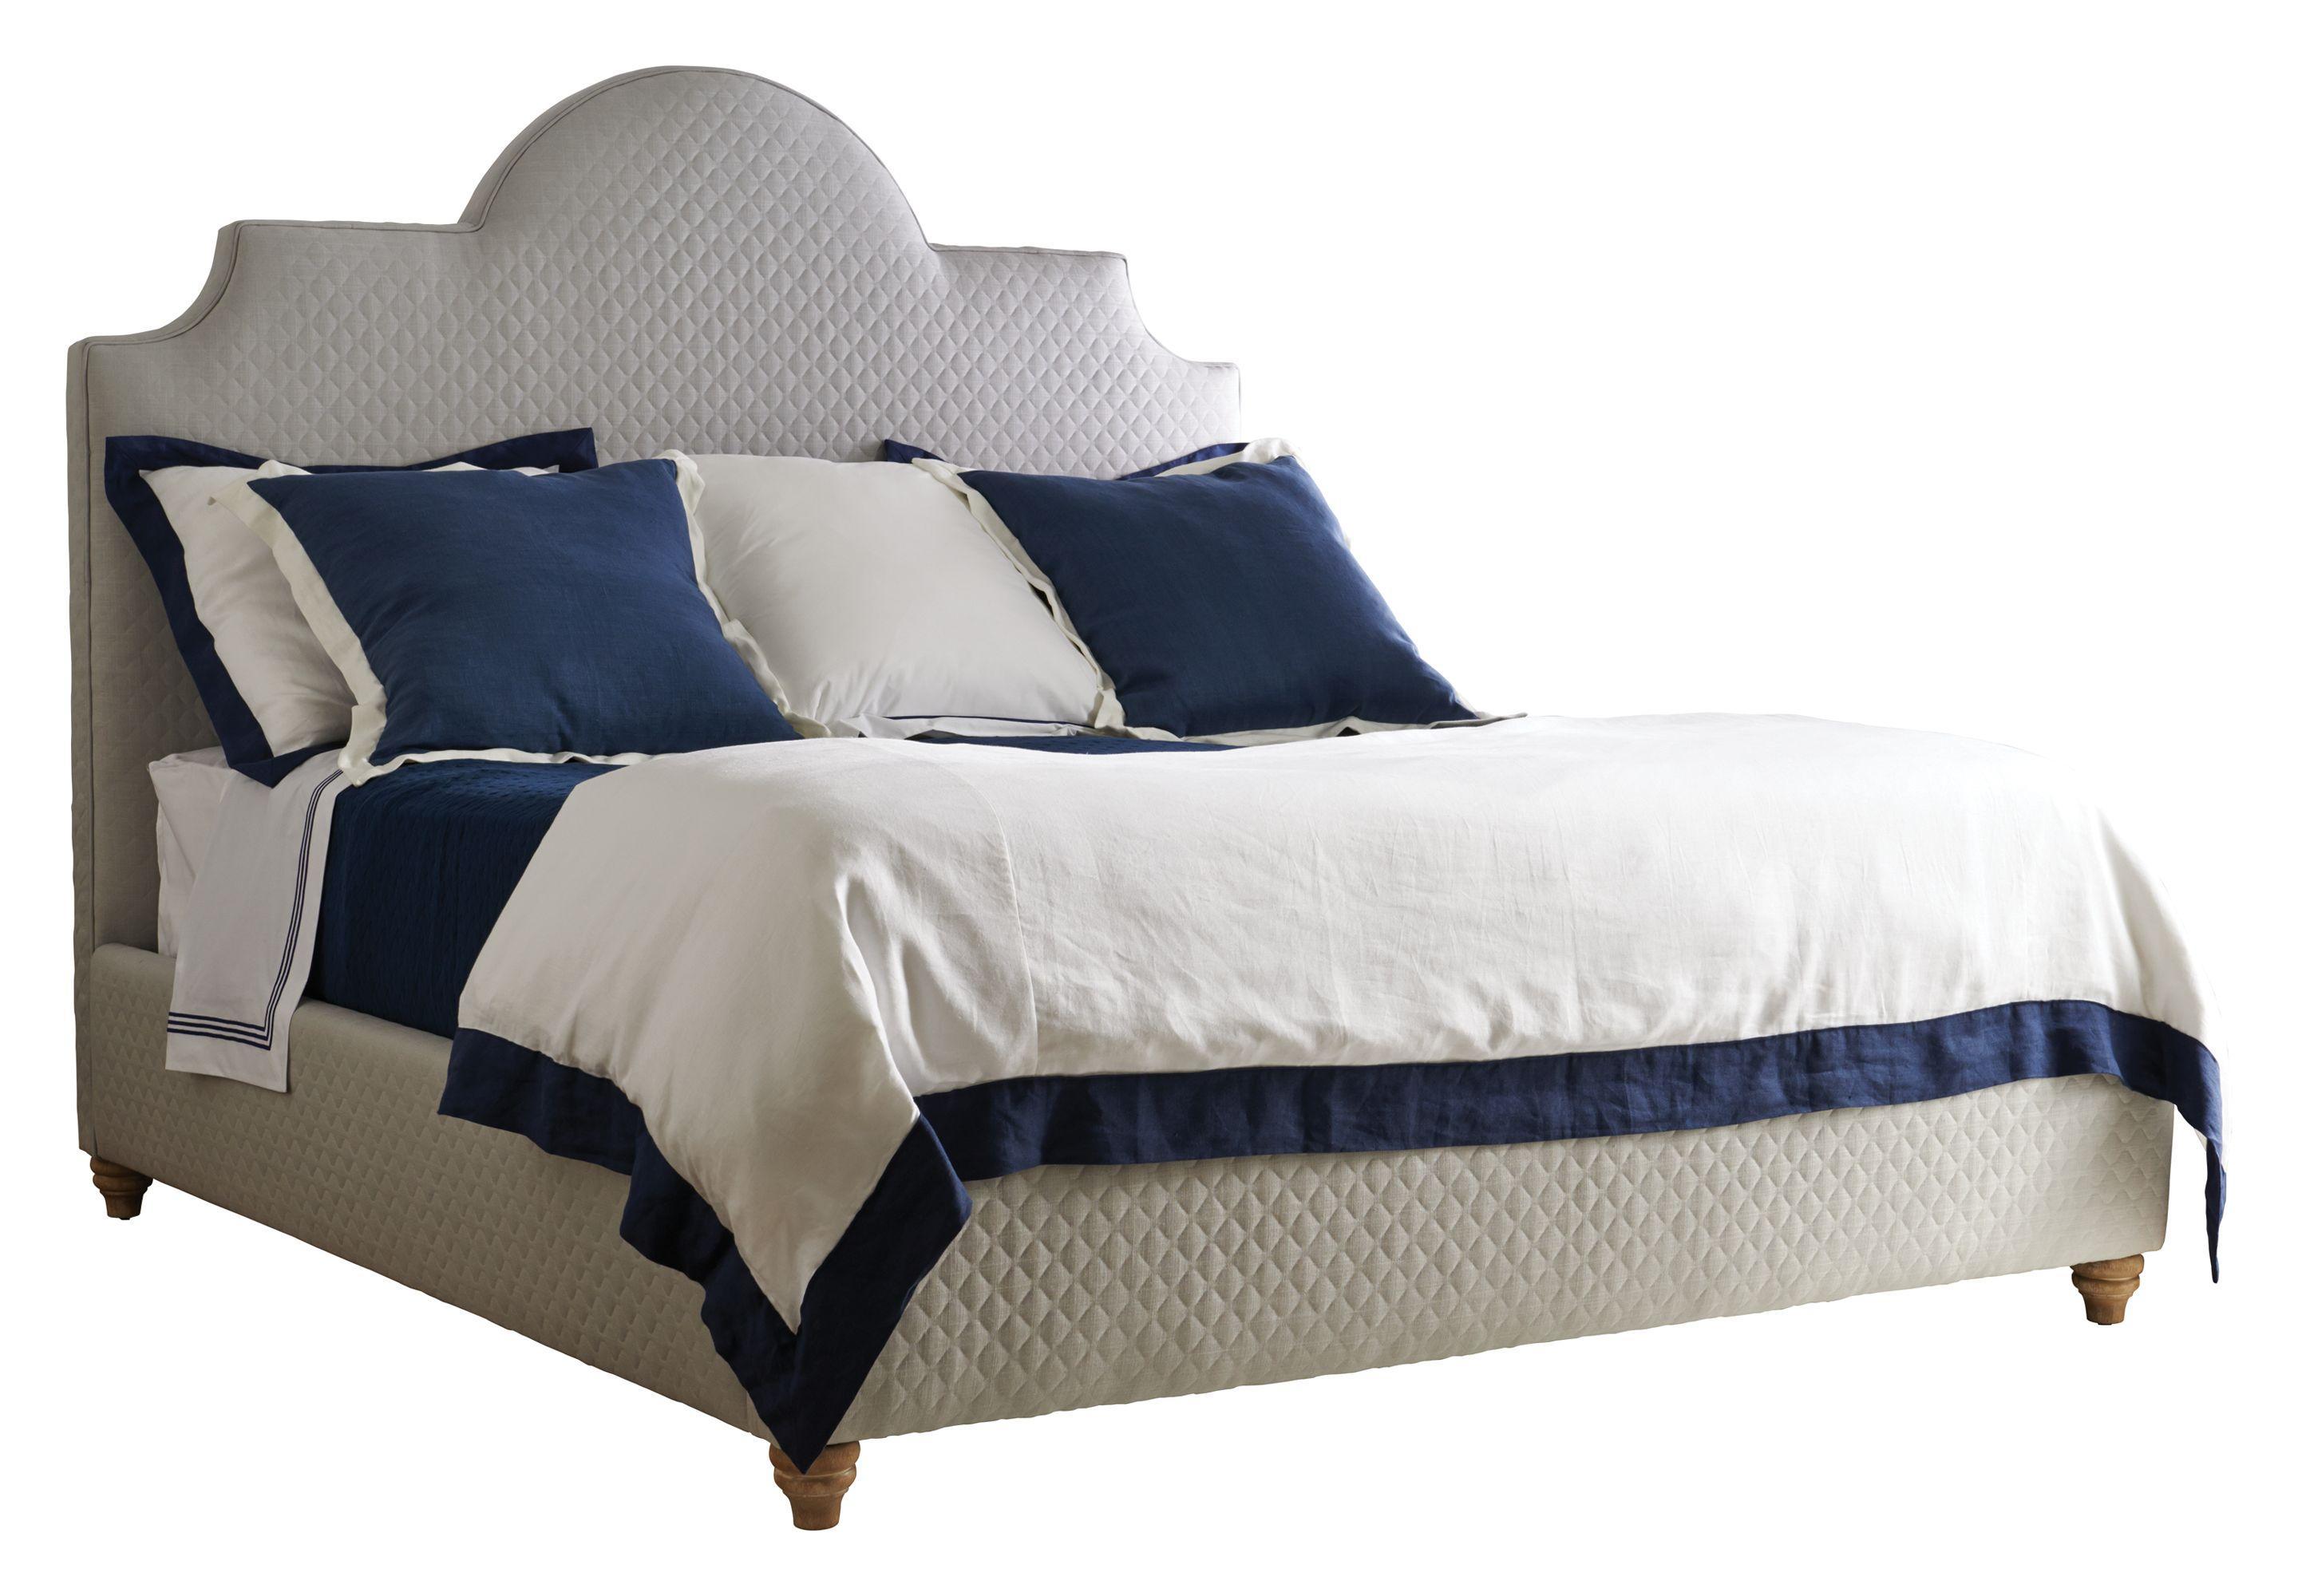 Stanley Furniture Coastal Living Retreat King Breach Inlet Bed - Item Number: 411-C3-53